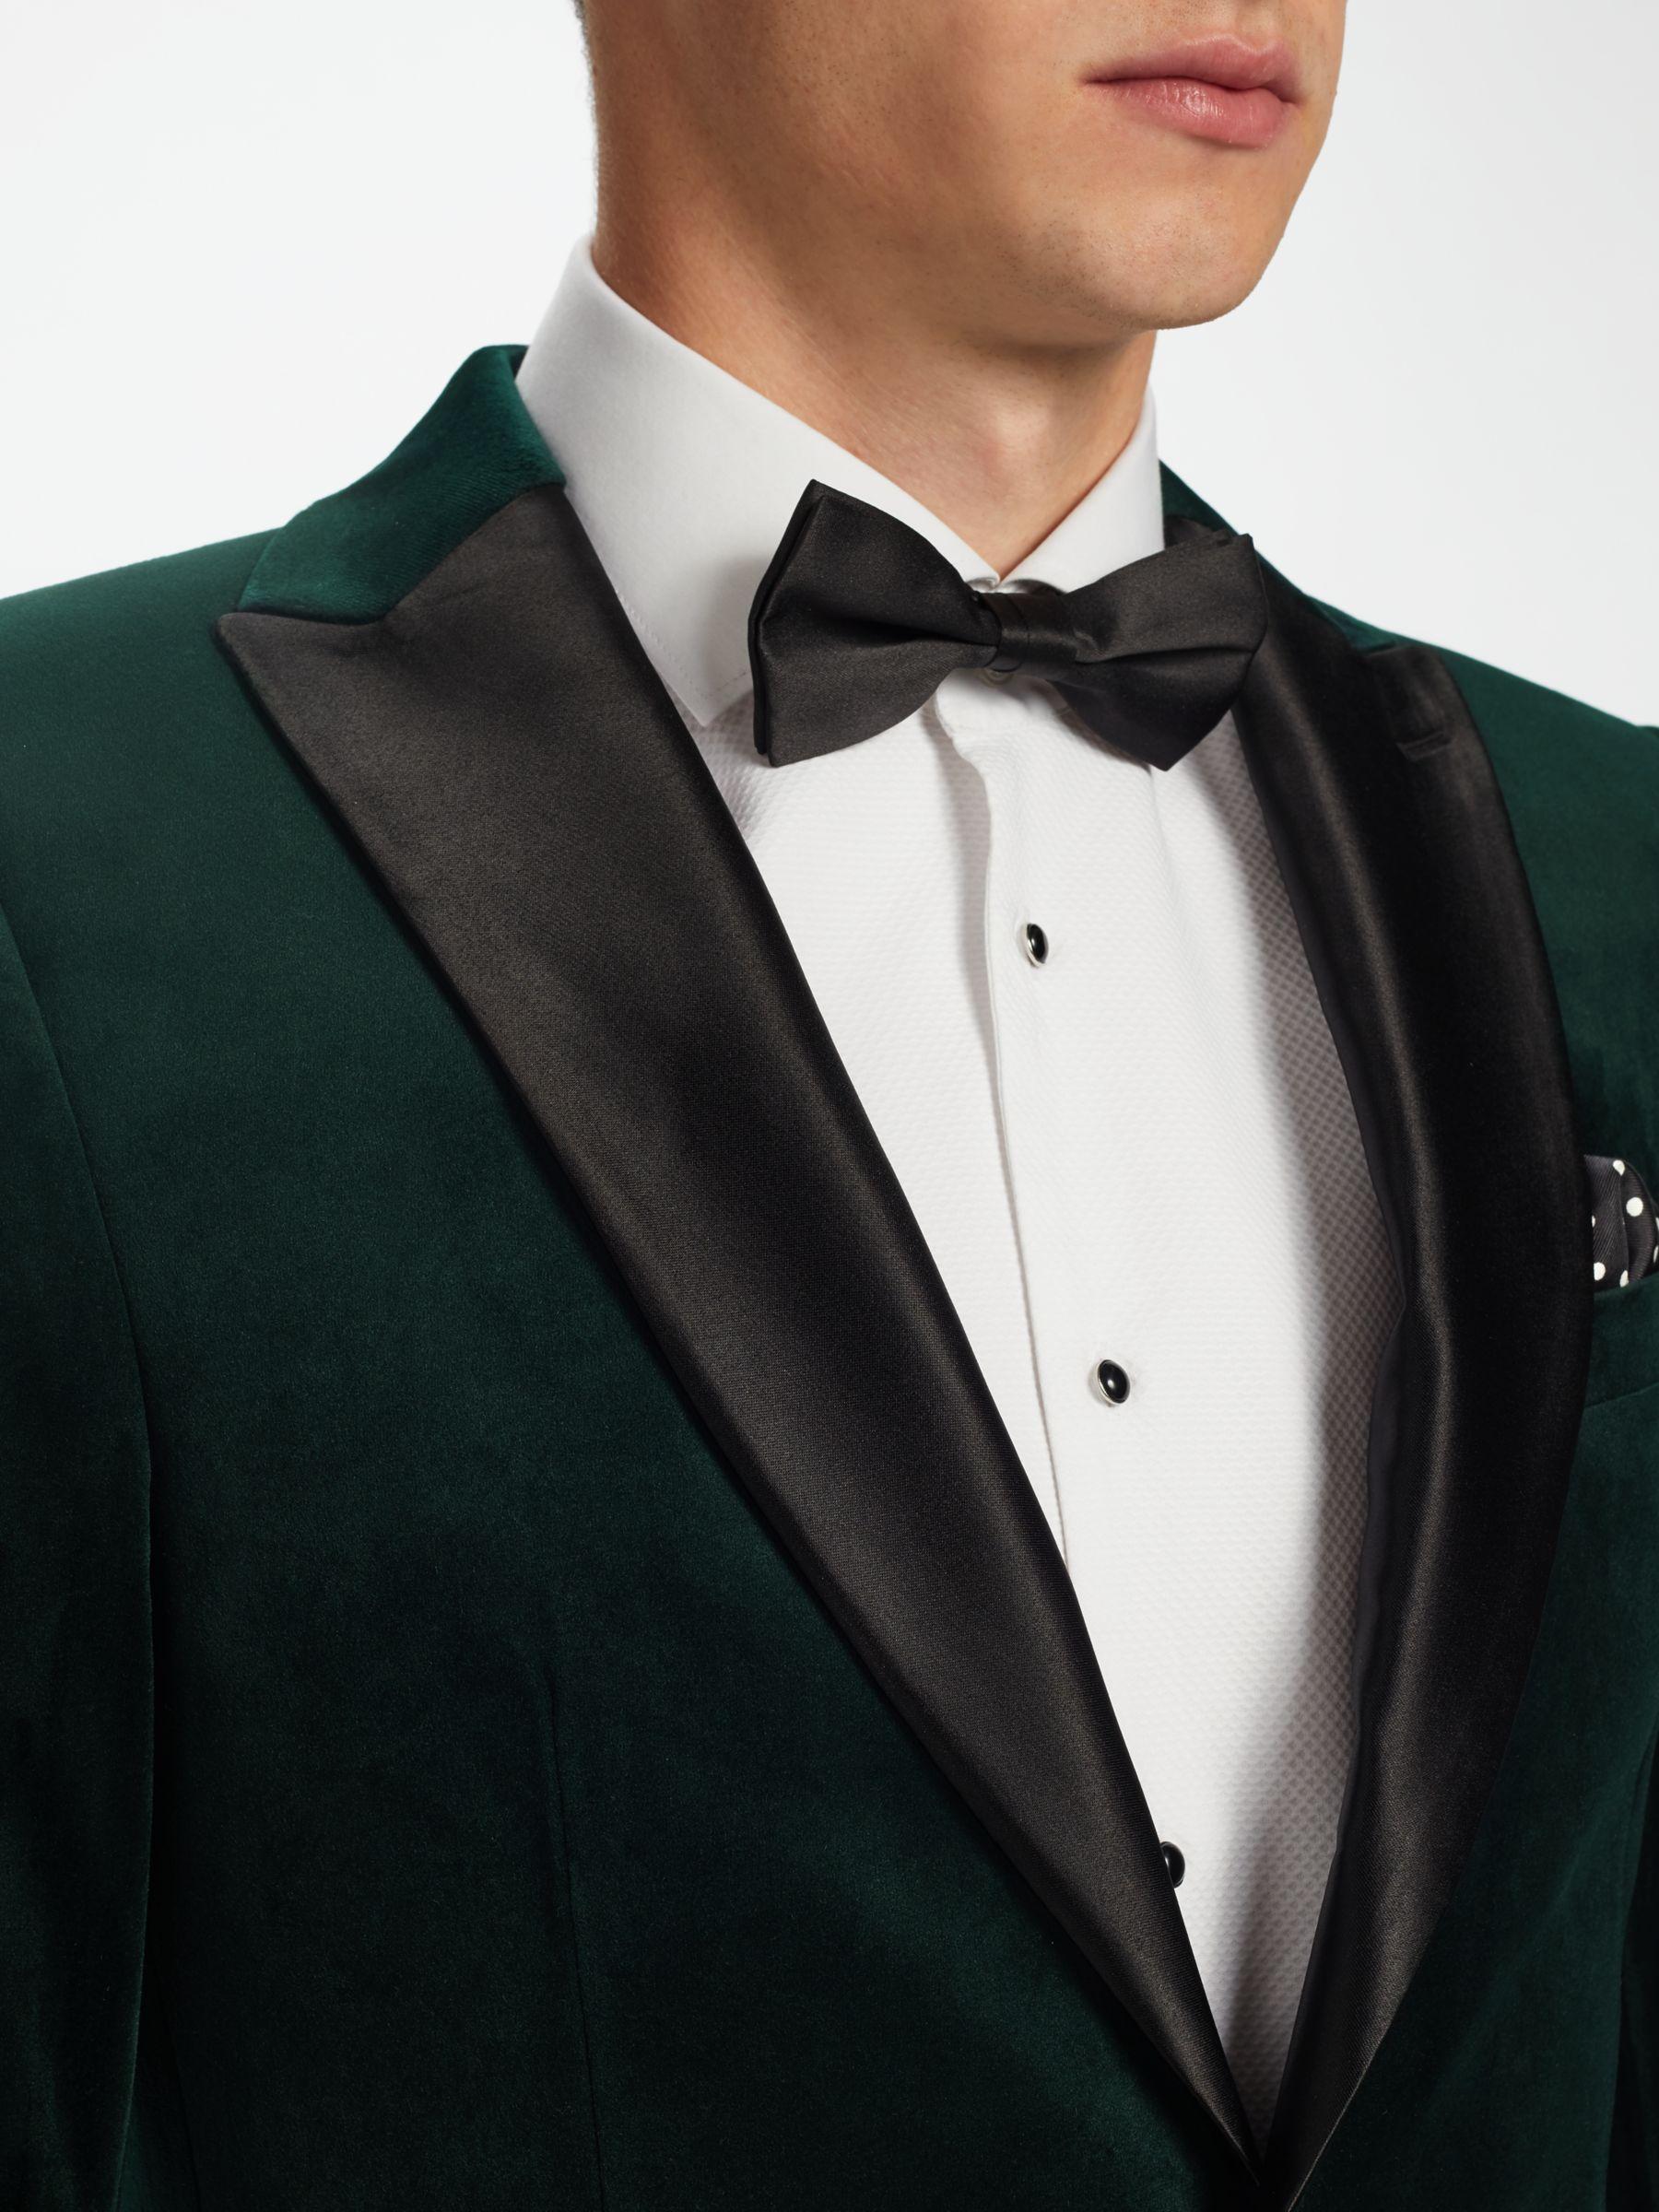 Kin Emerald Peak Lapel Velvet Jacket Emerald Green At John Lewis Partners